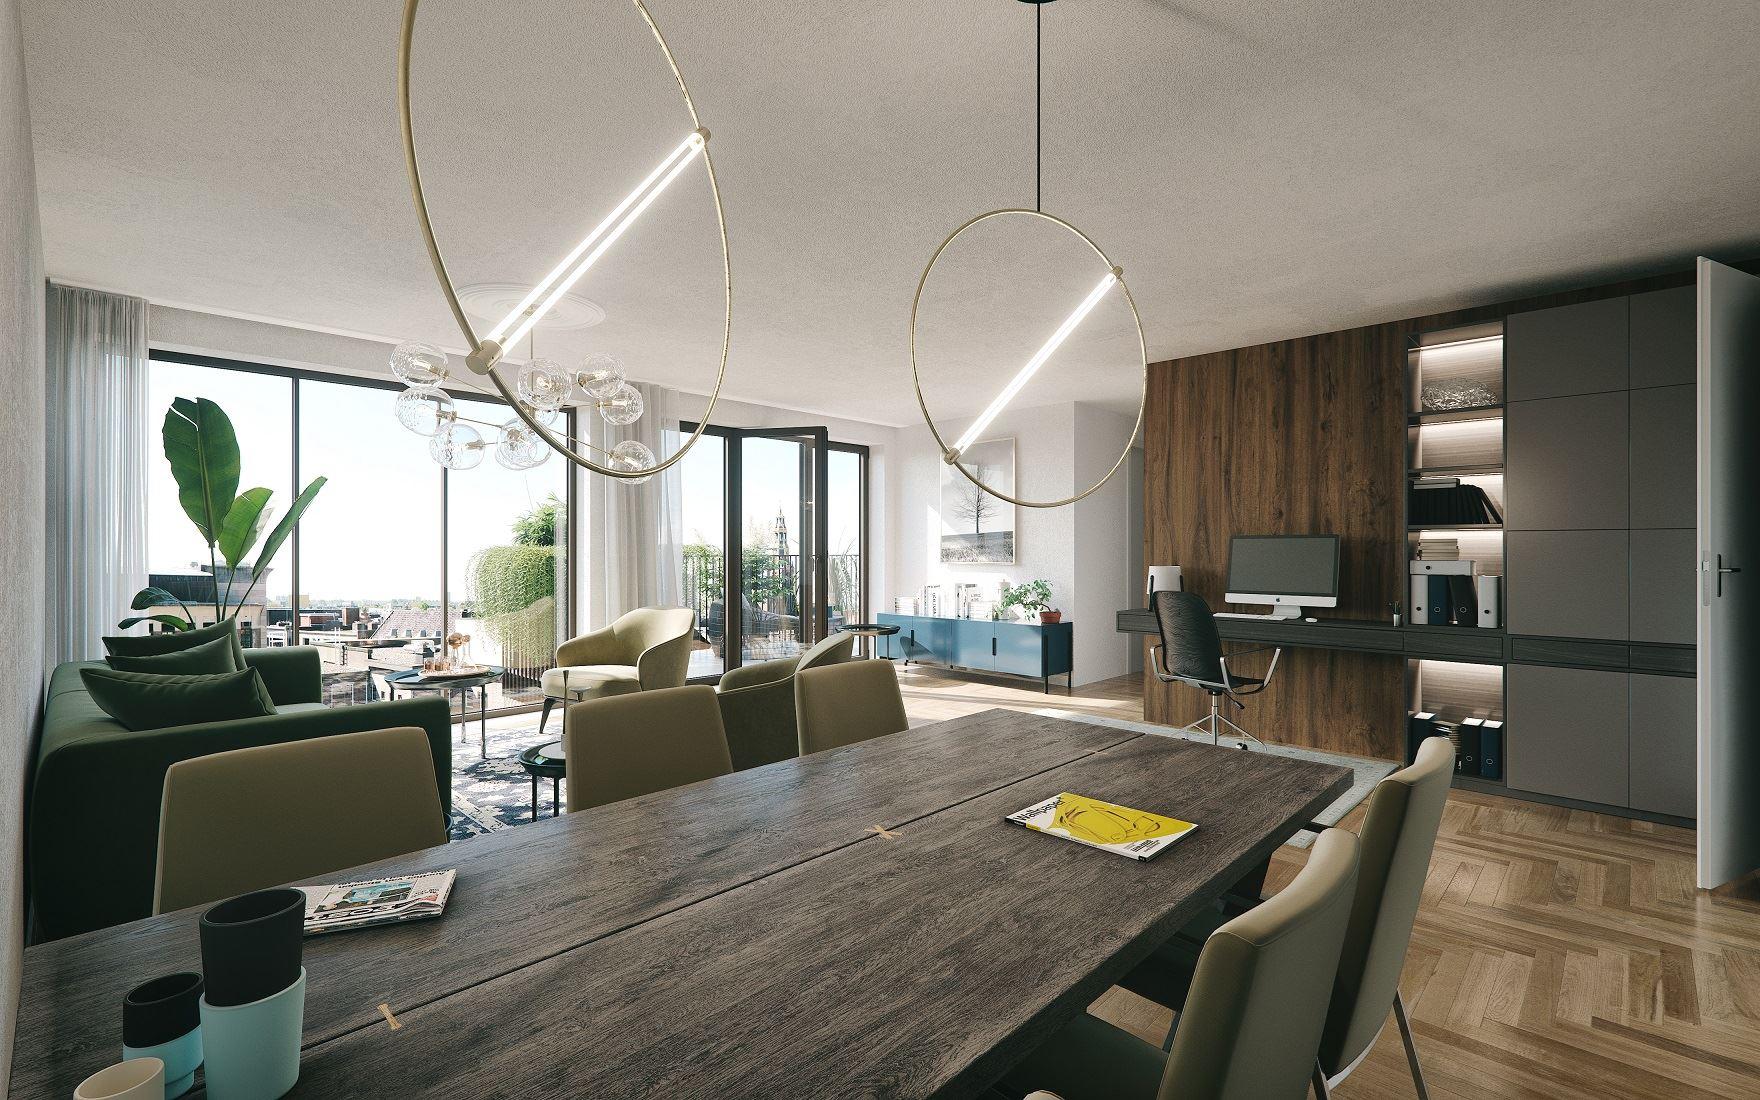 Mercado Groningen interieur impressie luxe appartement